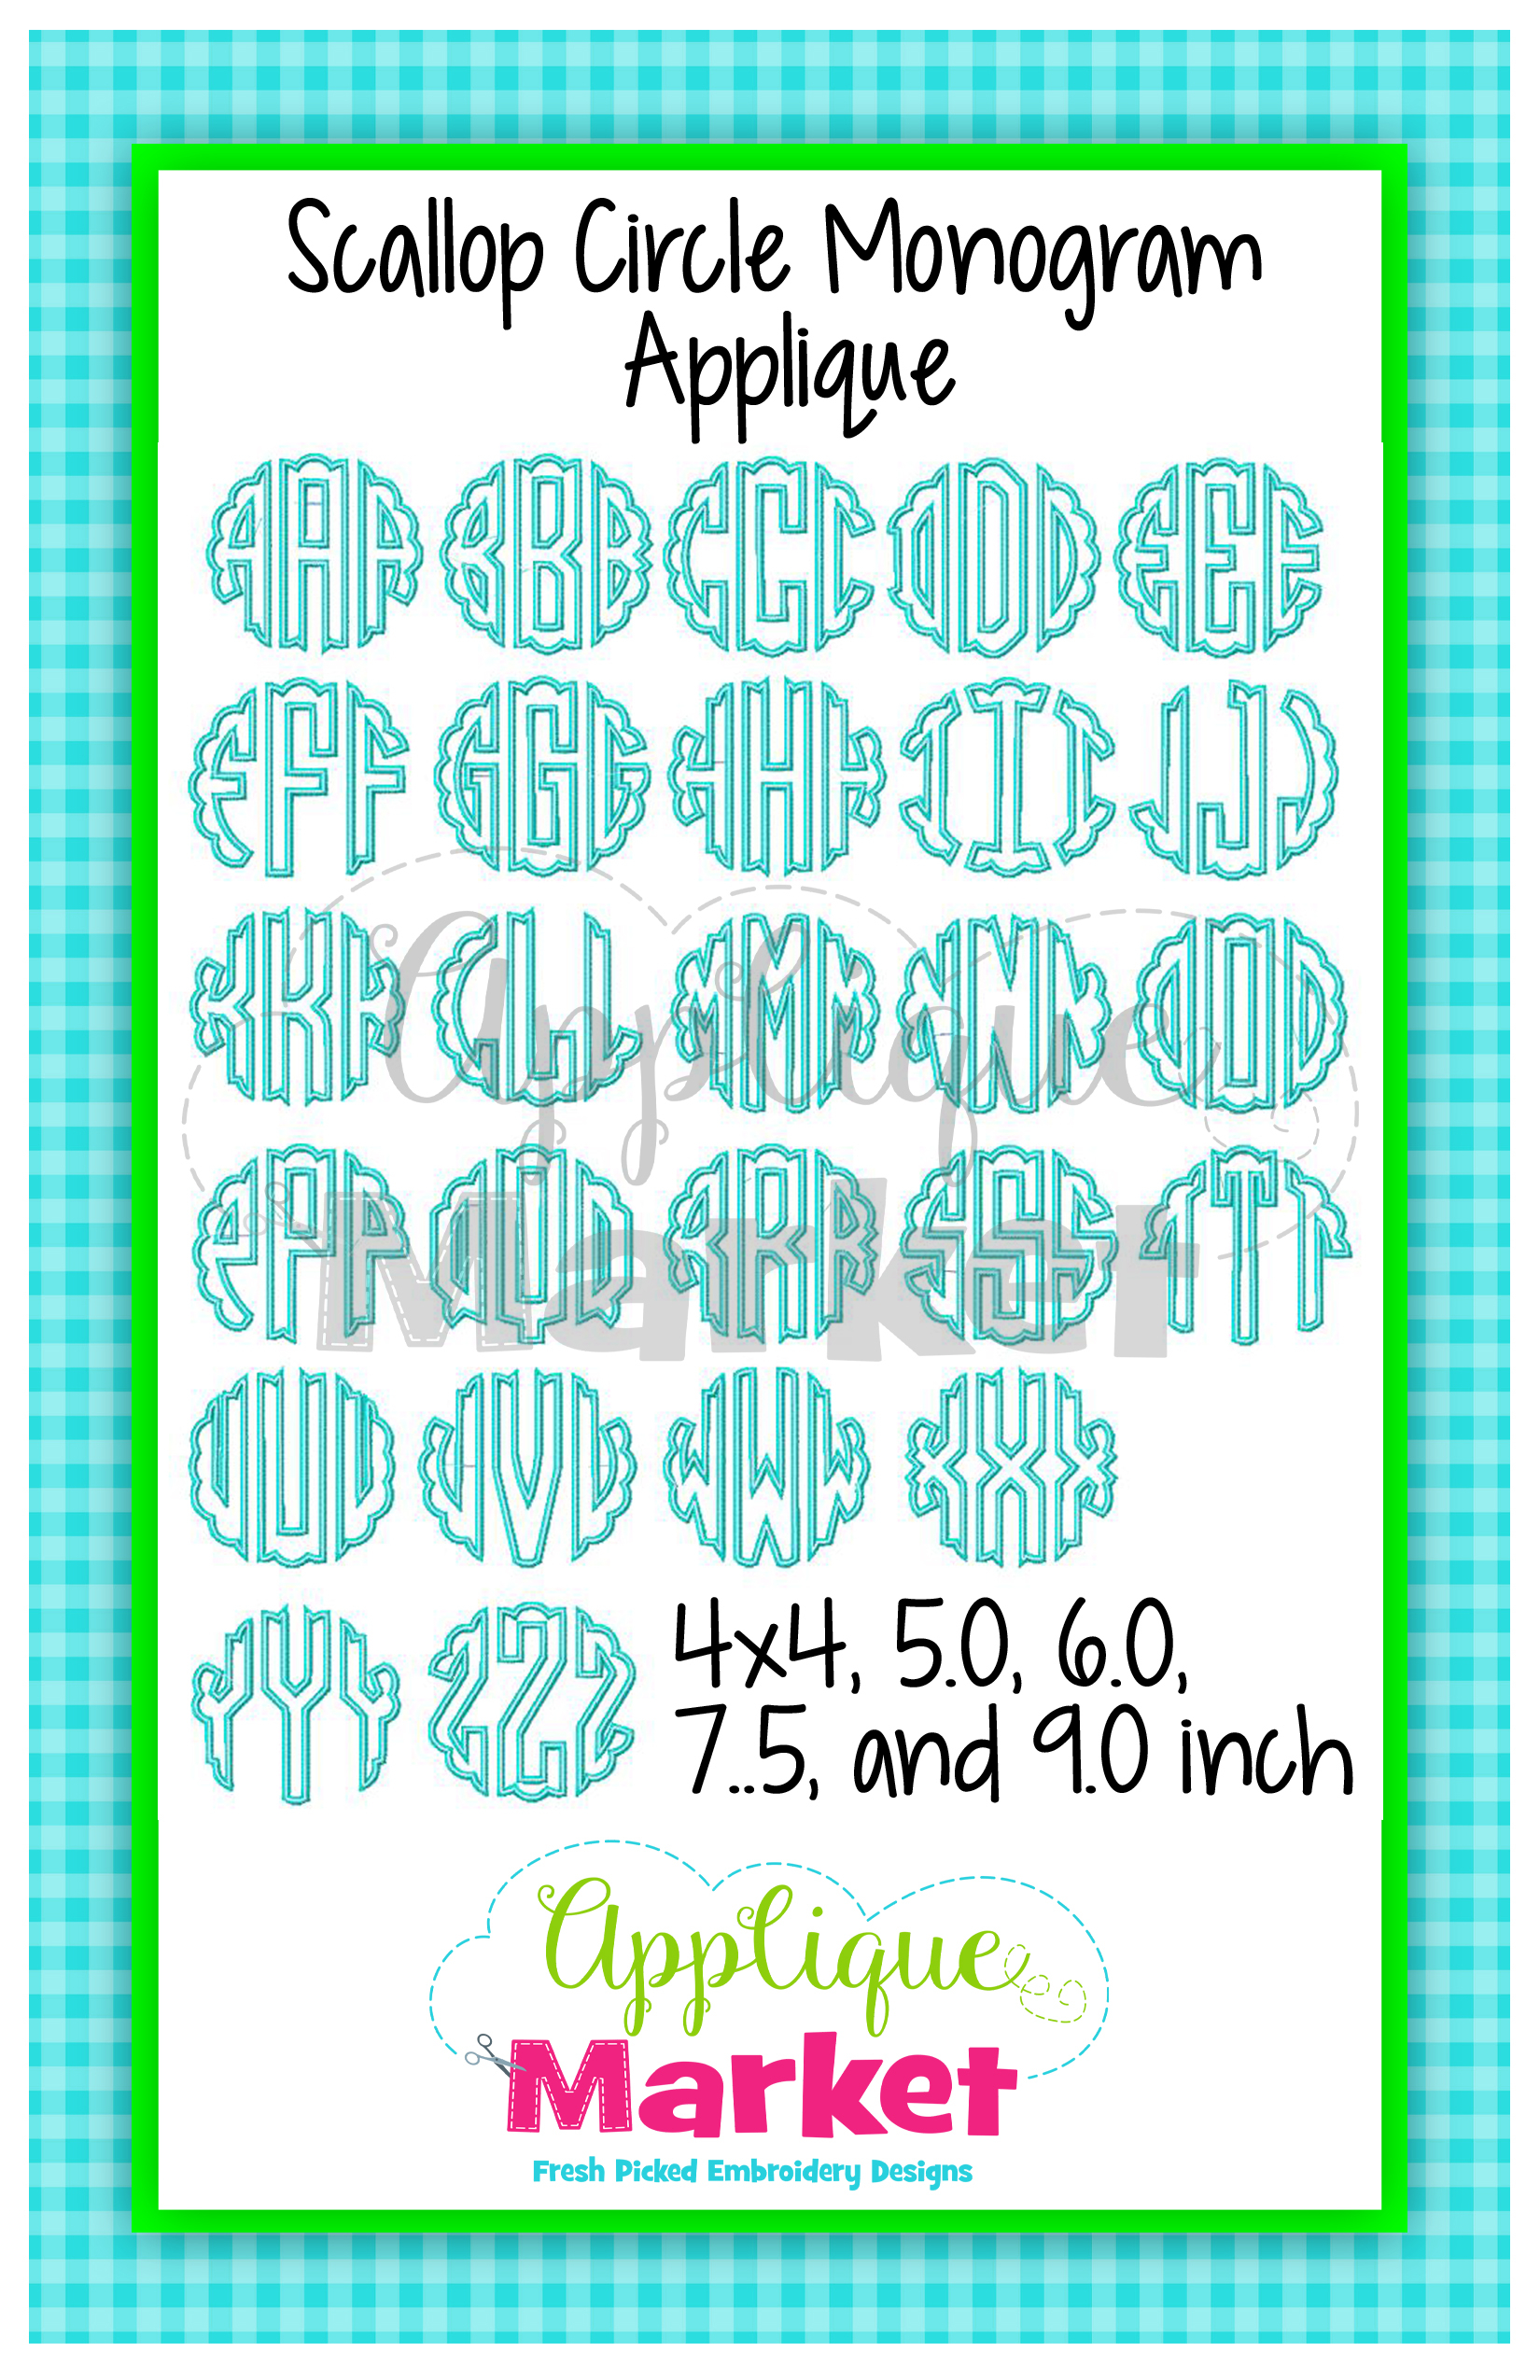 Scallop Circle Monogram Applique Design